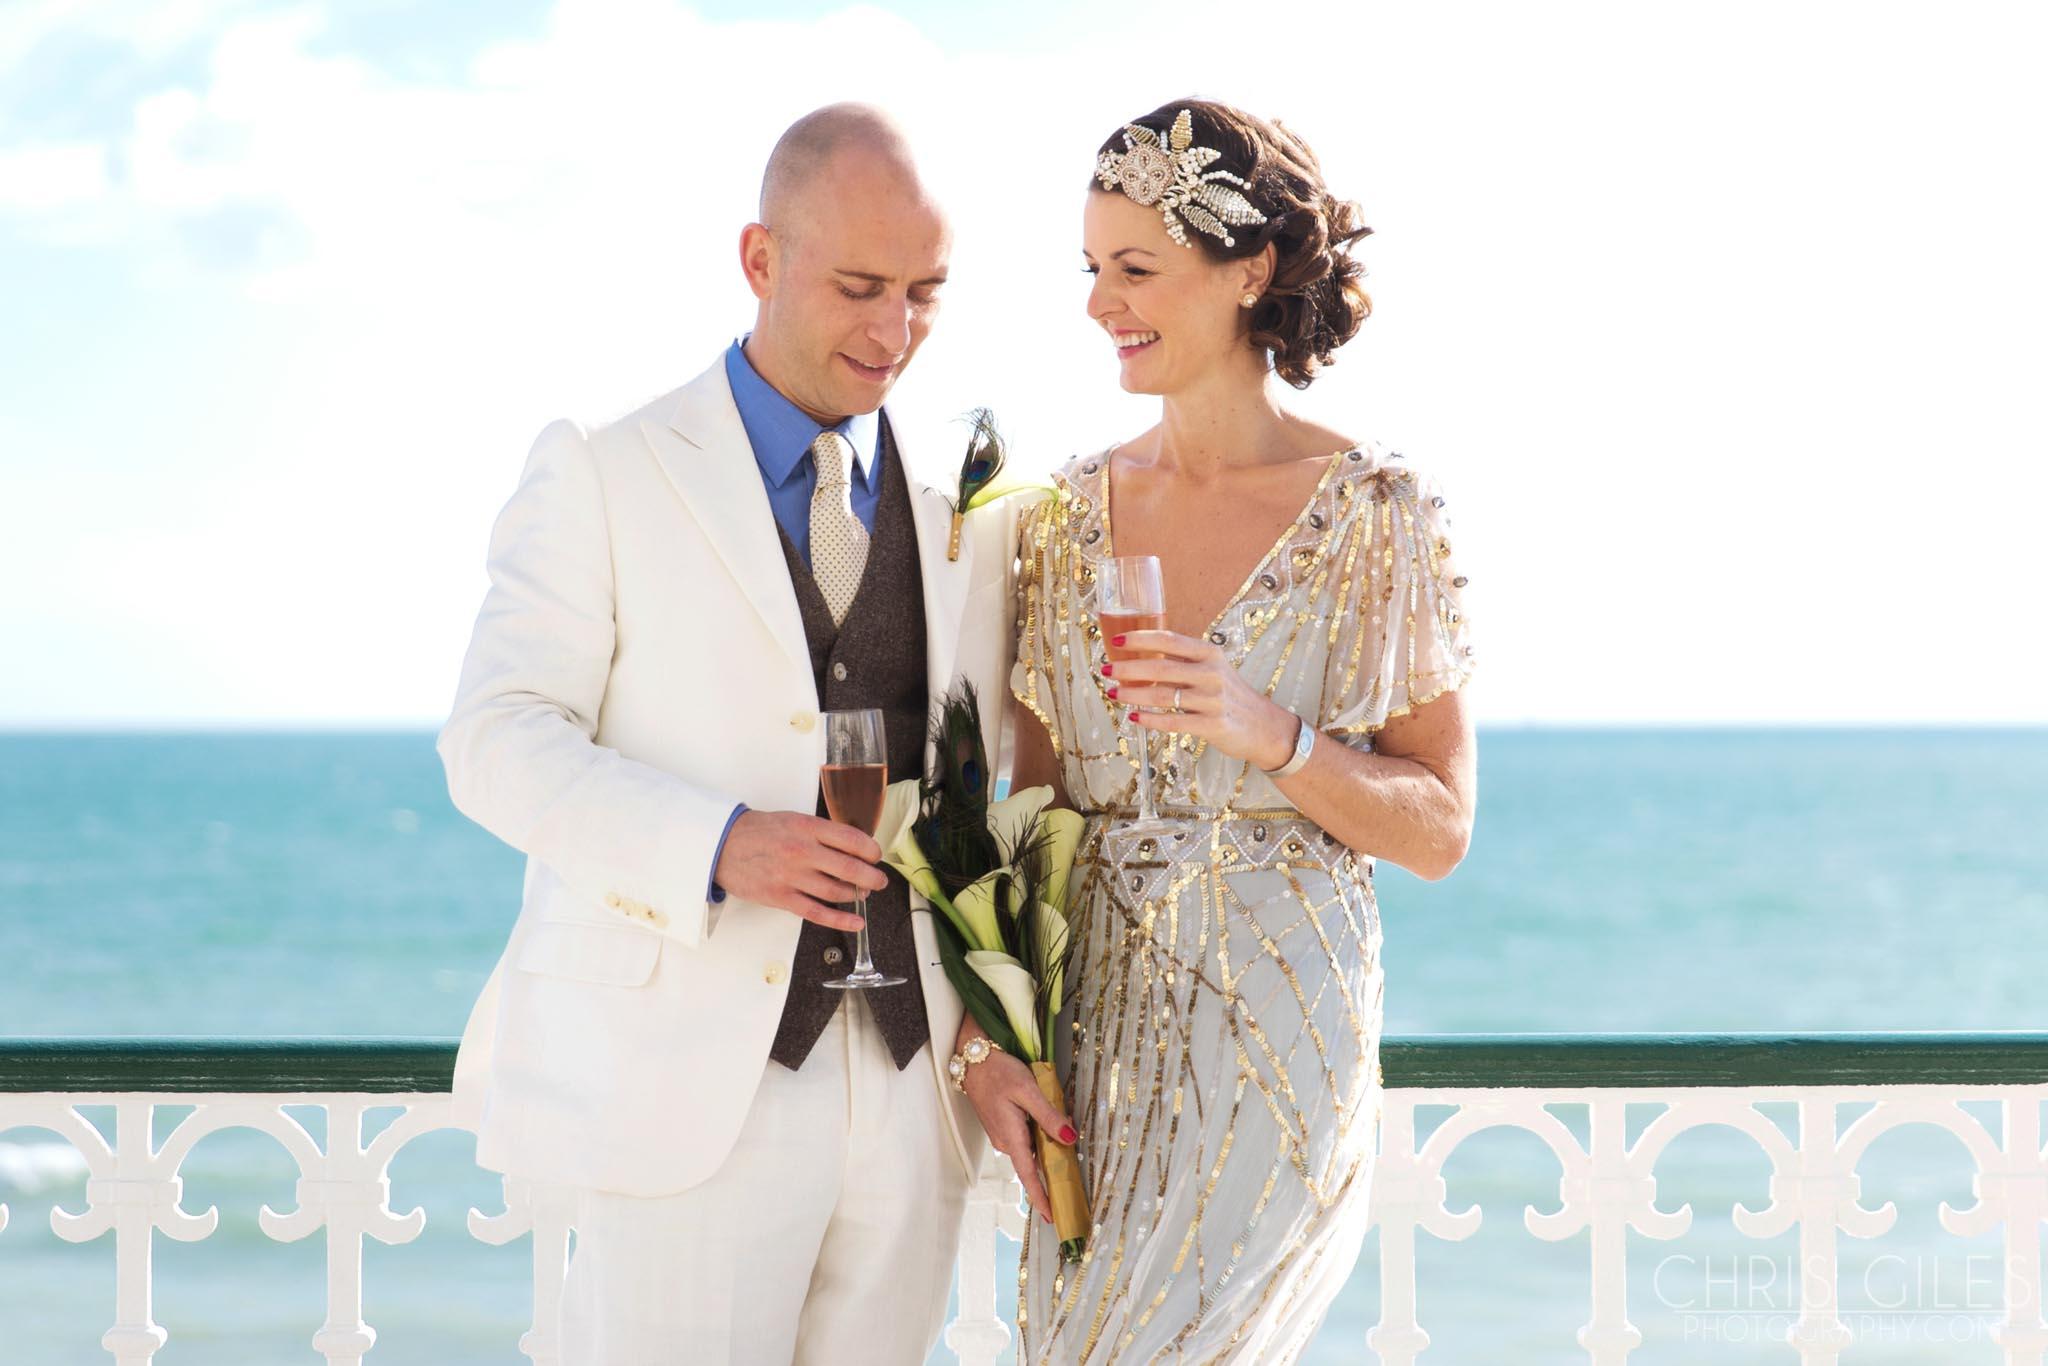 1920s-brighton-wedding-26